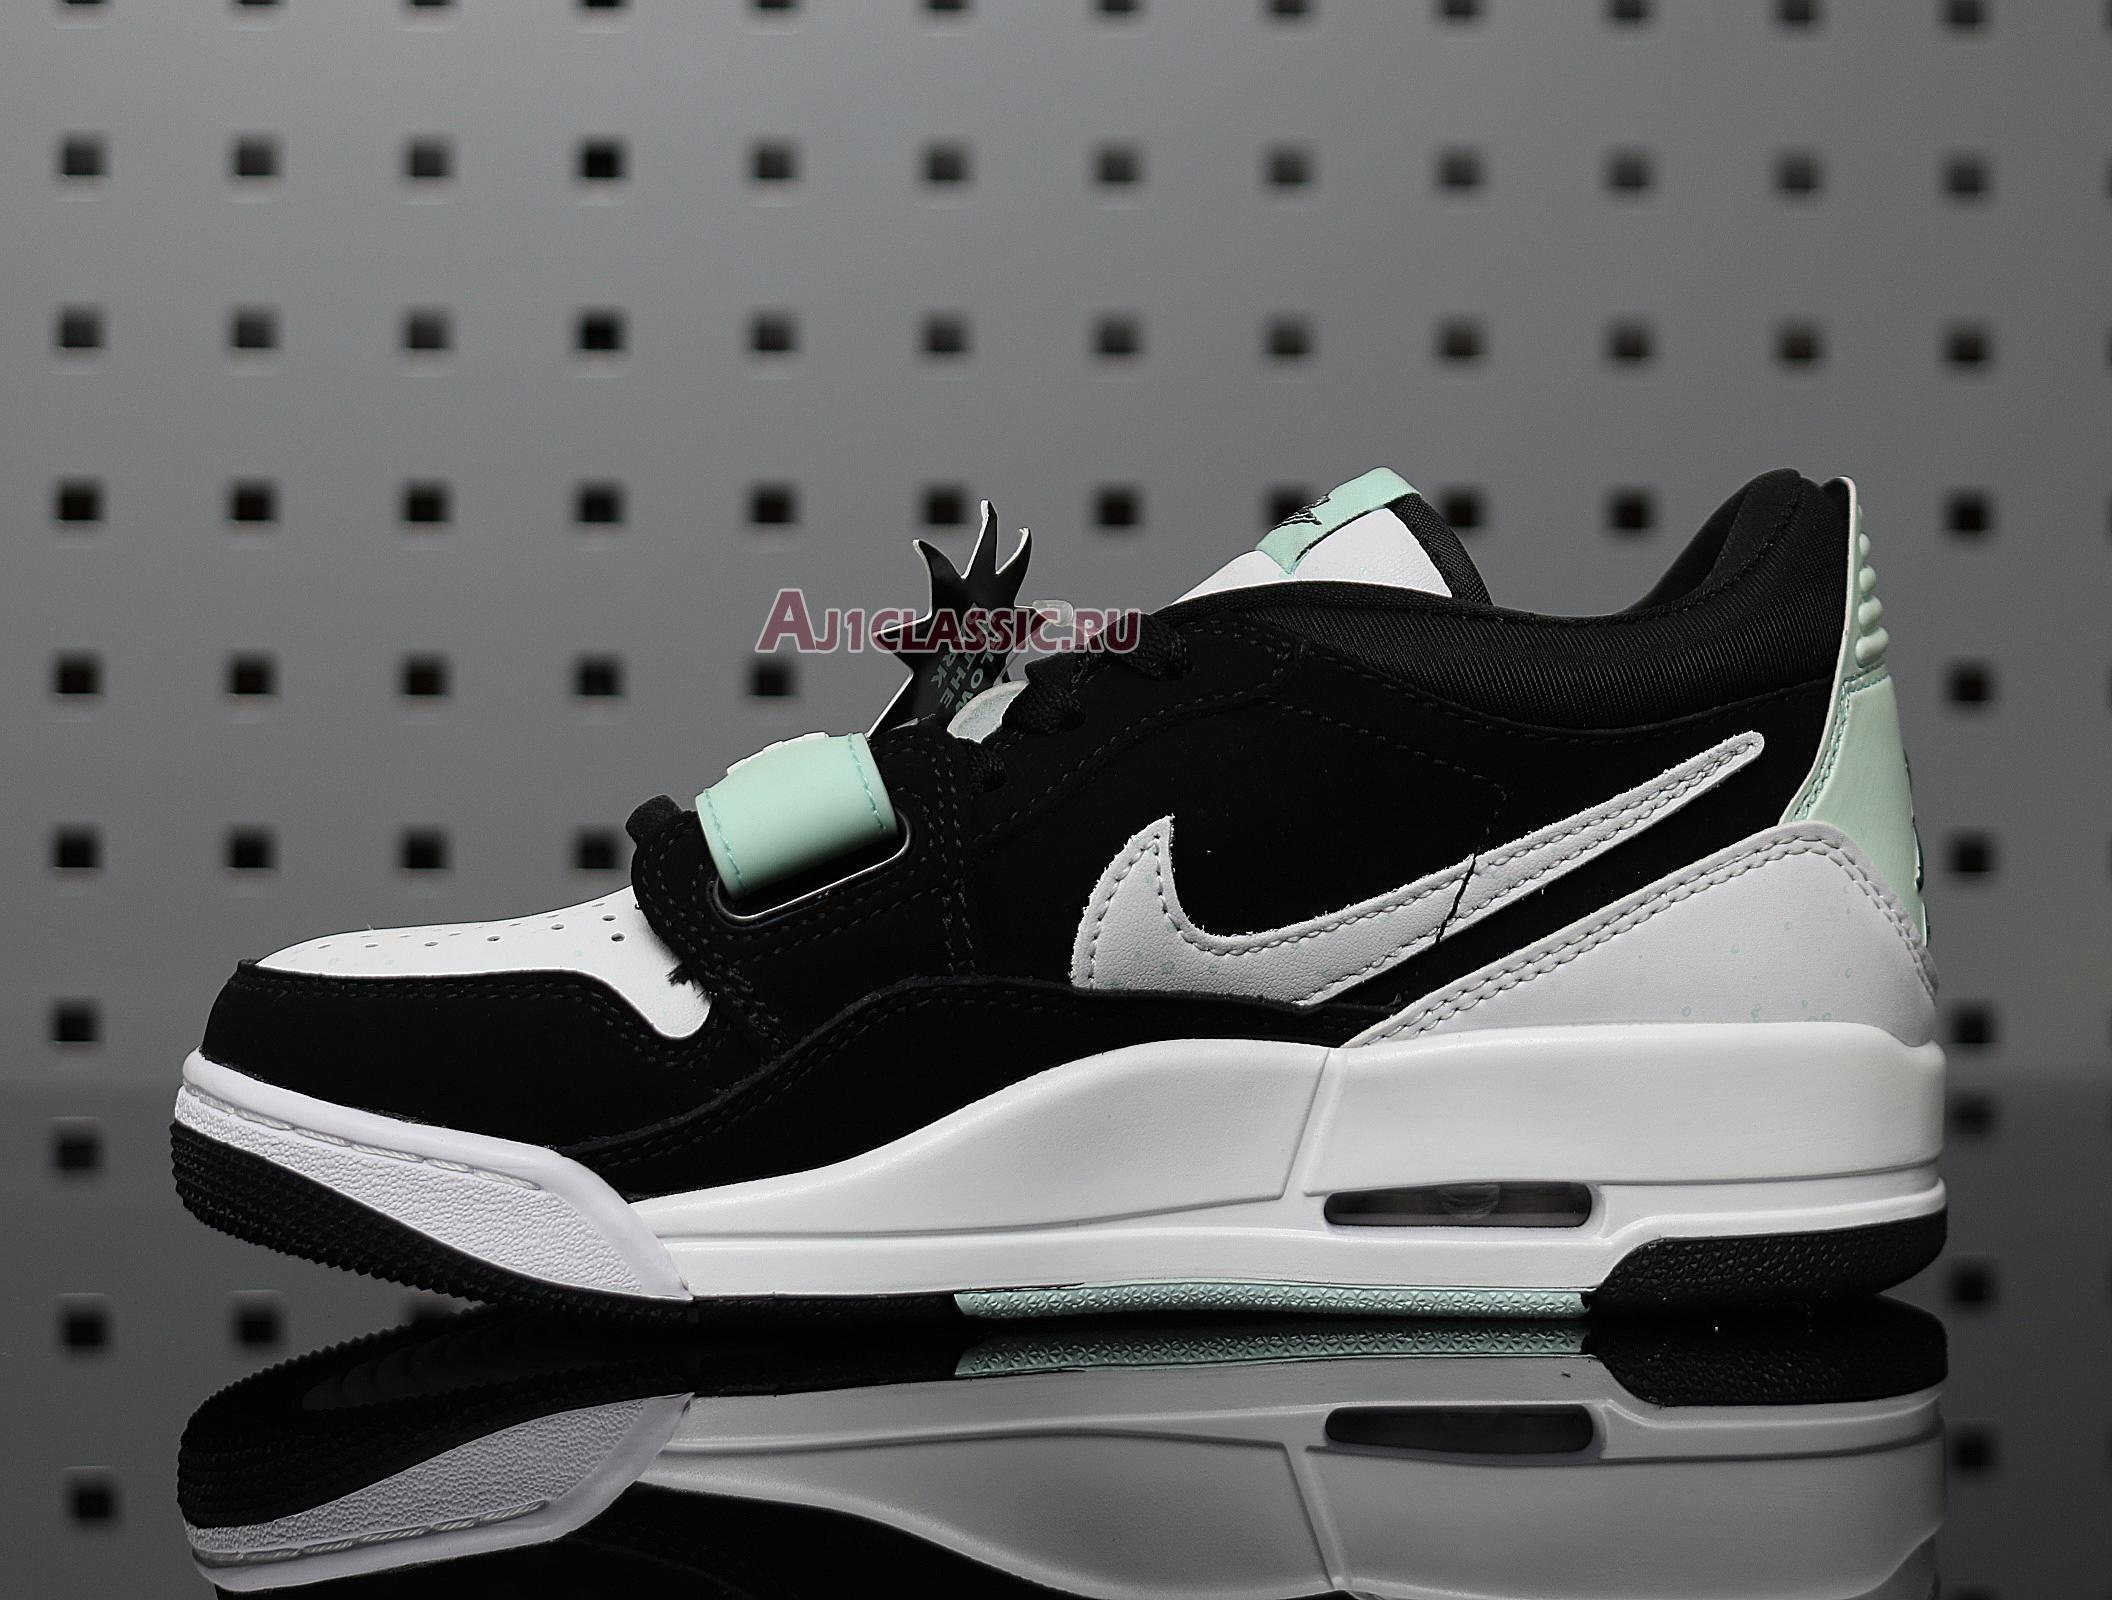 "Air Jordan Legacy 312 Low ""Black Teal Tint"" CJ5500-013"